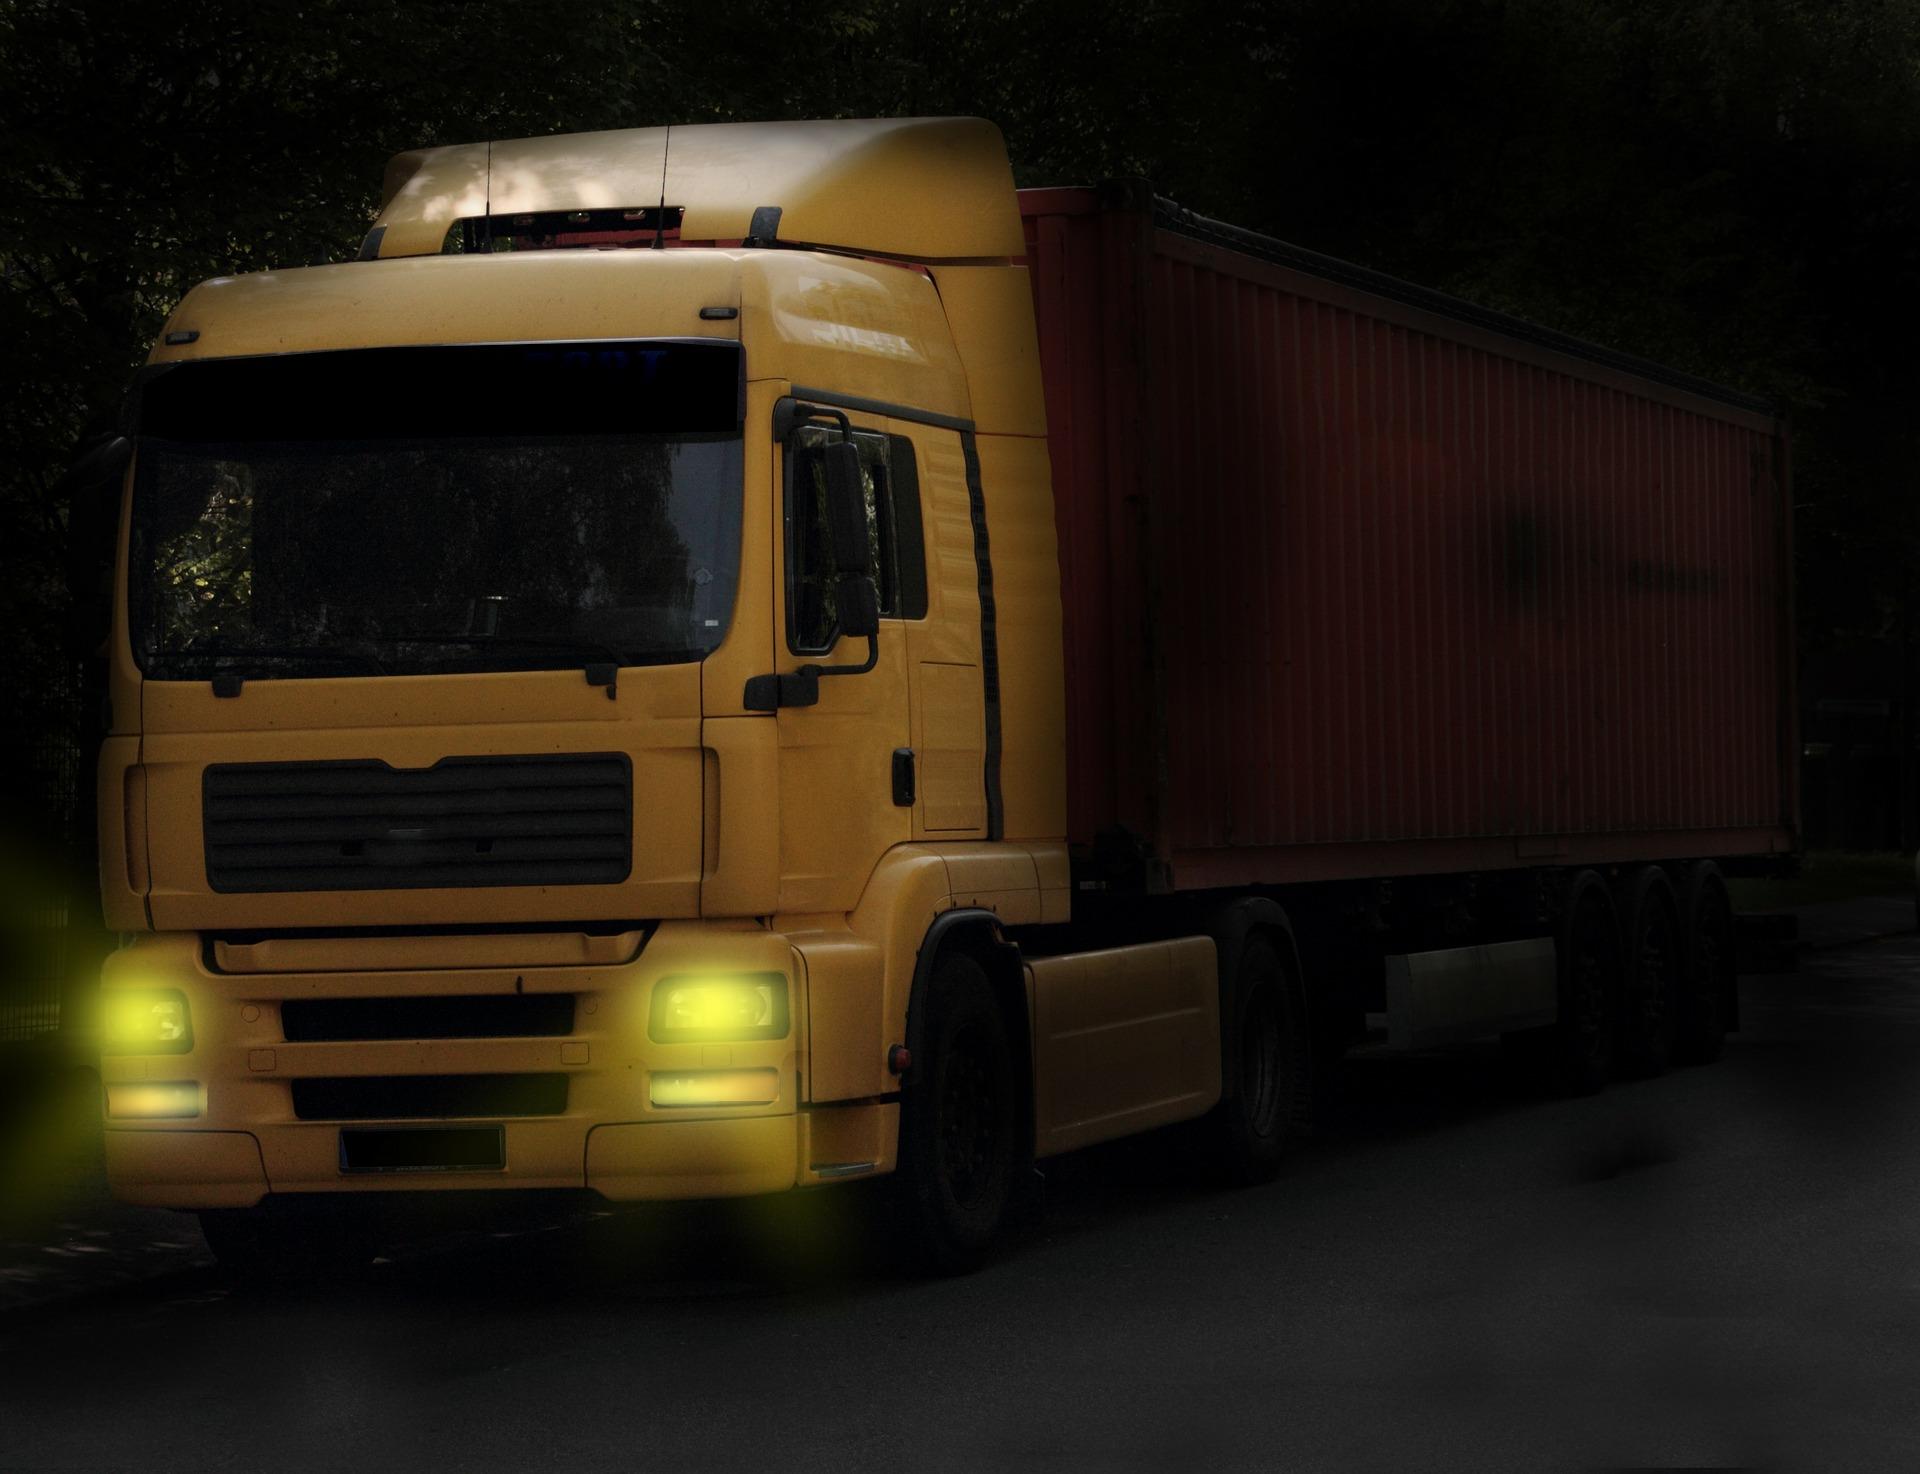 truck-333249_1920